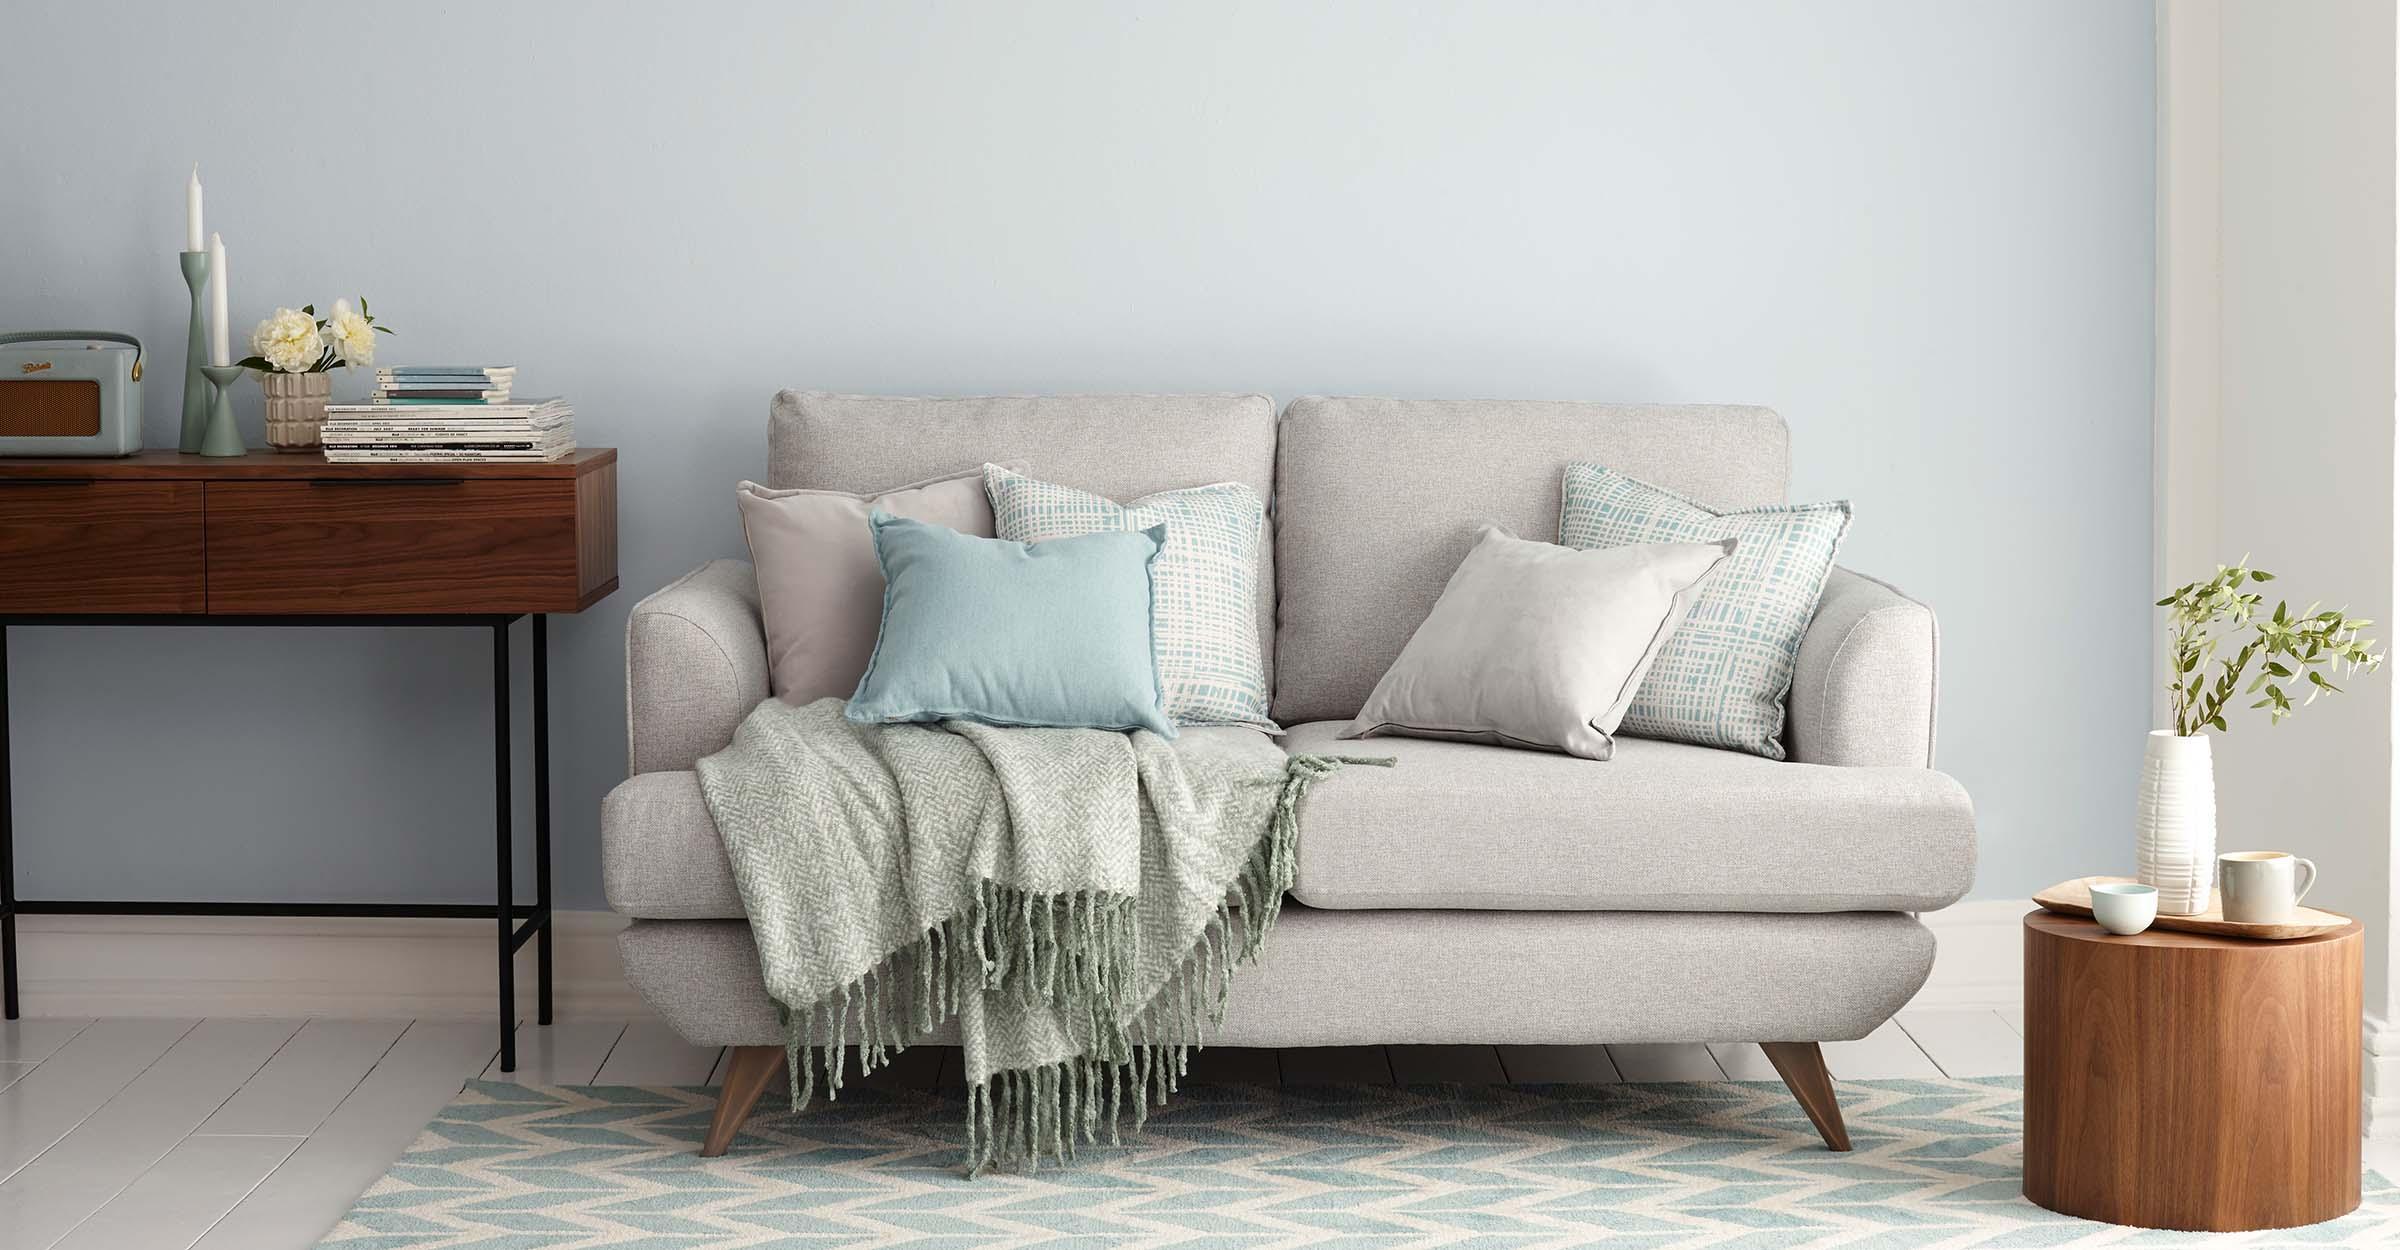 Swell 2 Seater Sofas Small Sofas Dfs Uwap Interior Chair Design Uwaporg